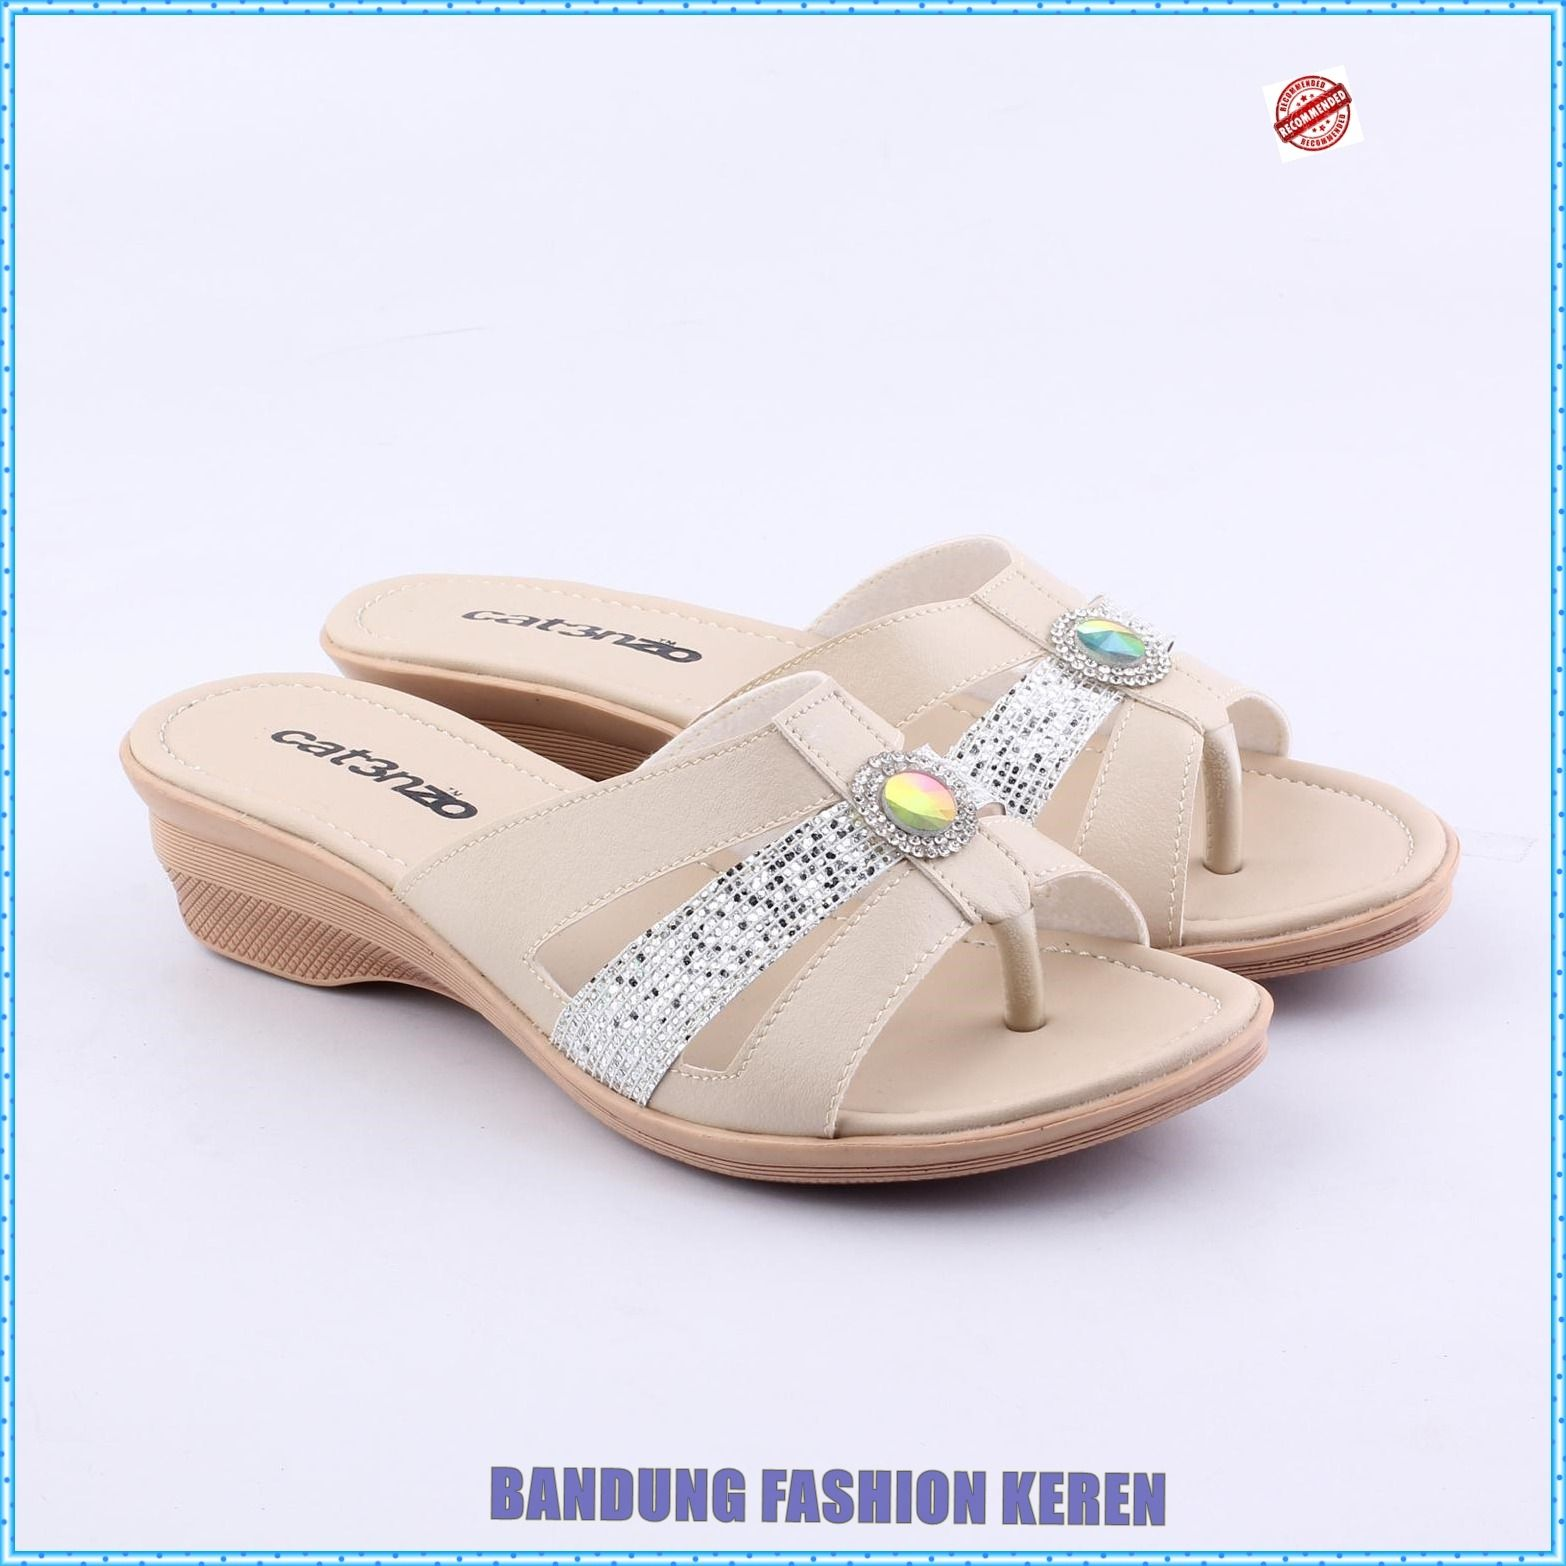 Sandal Casual Wanita Tg 170 Produk Fashion Handmade Terbaik 100